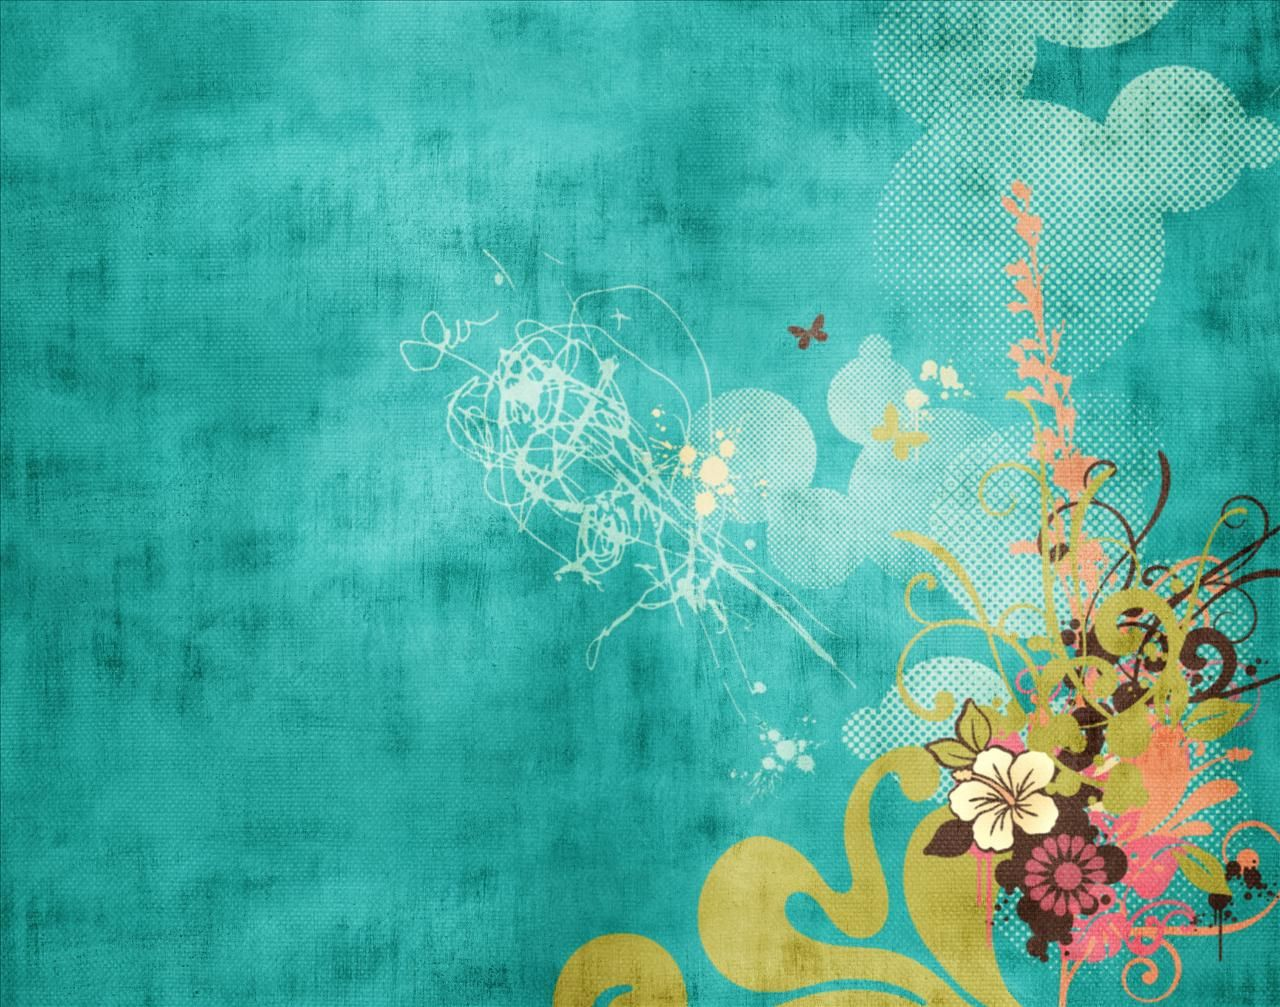 100% Quality HD Live Blue Backgrounds - 6016098, Timika Infante